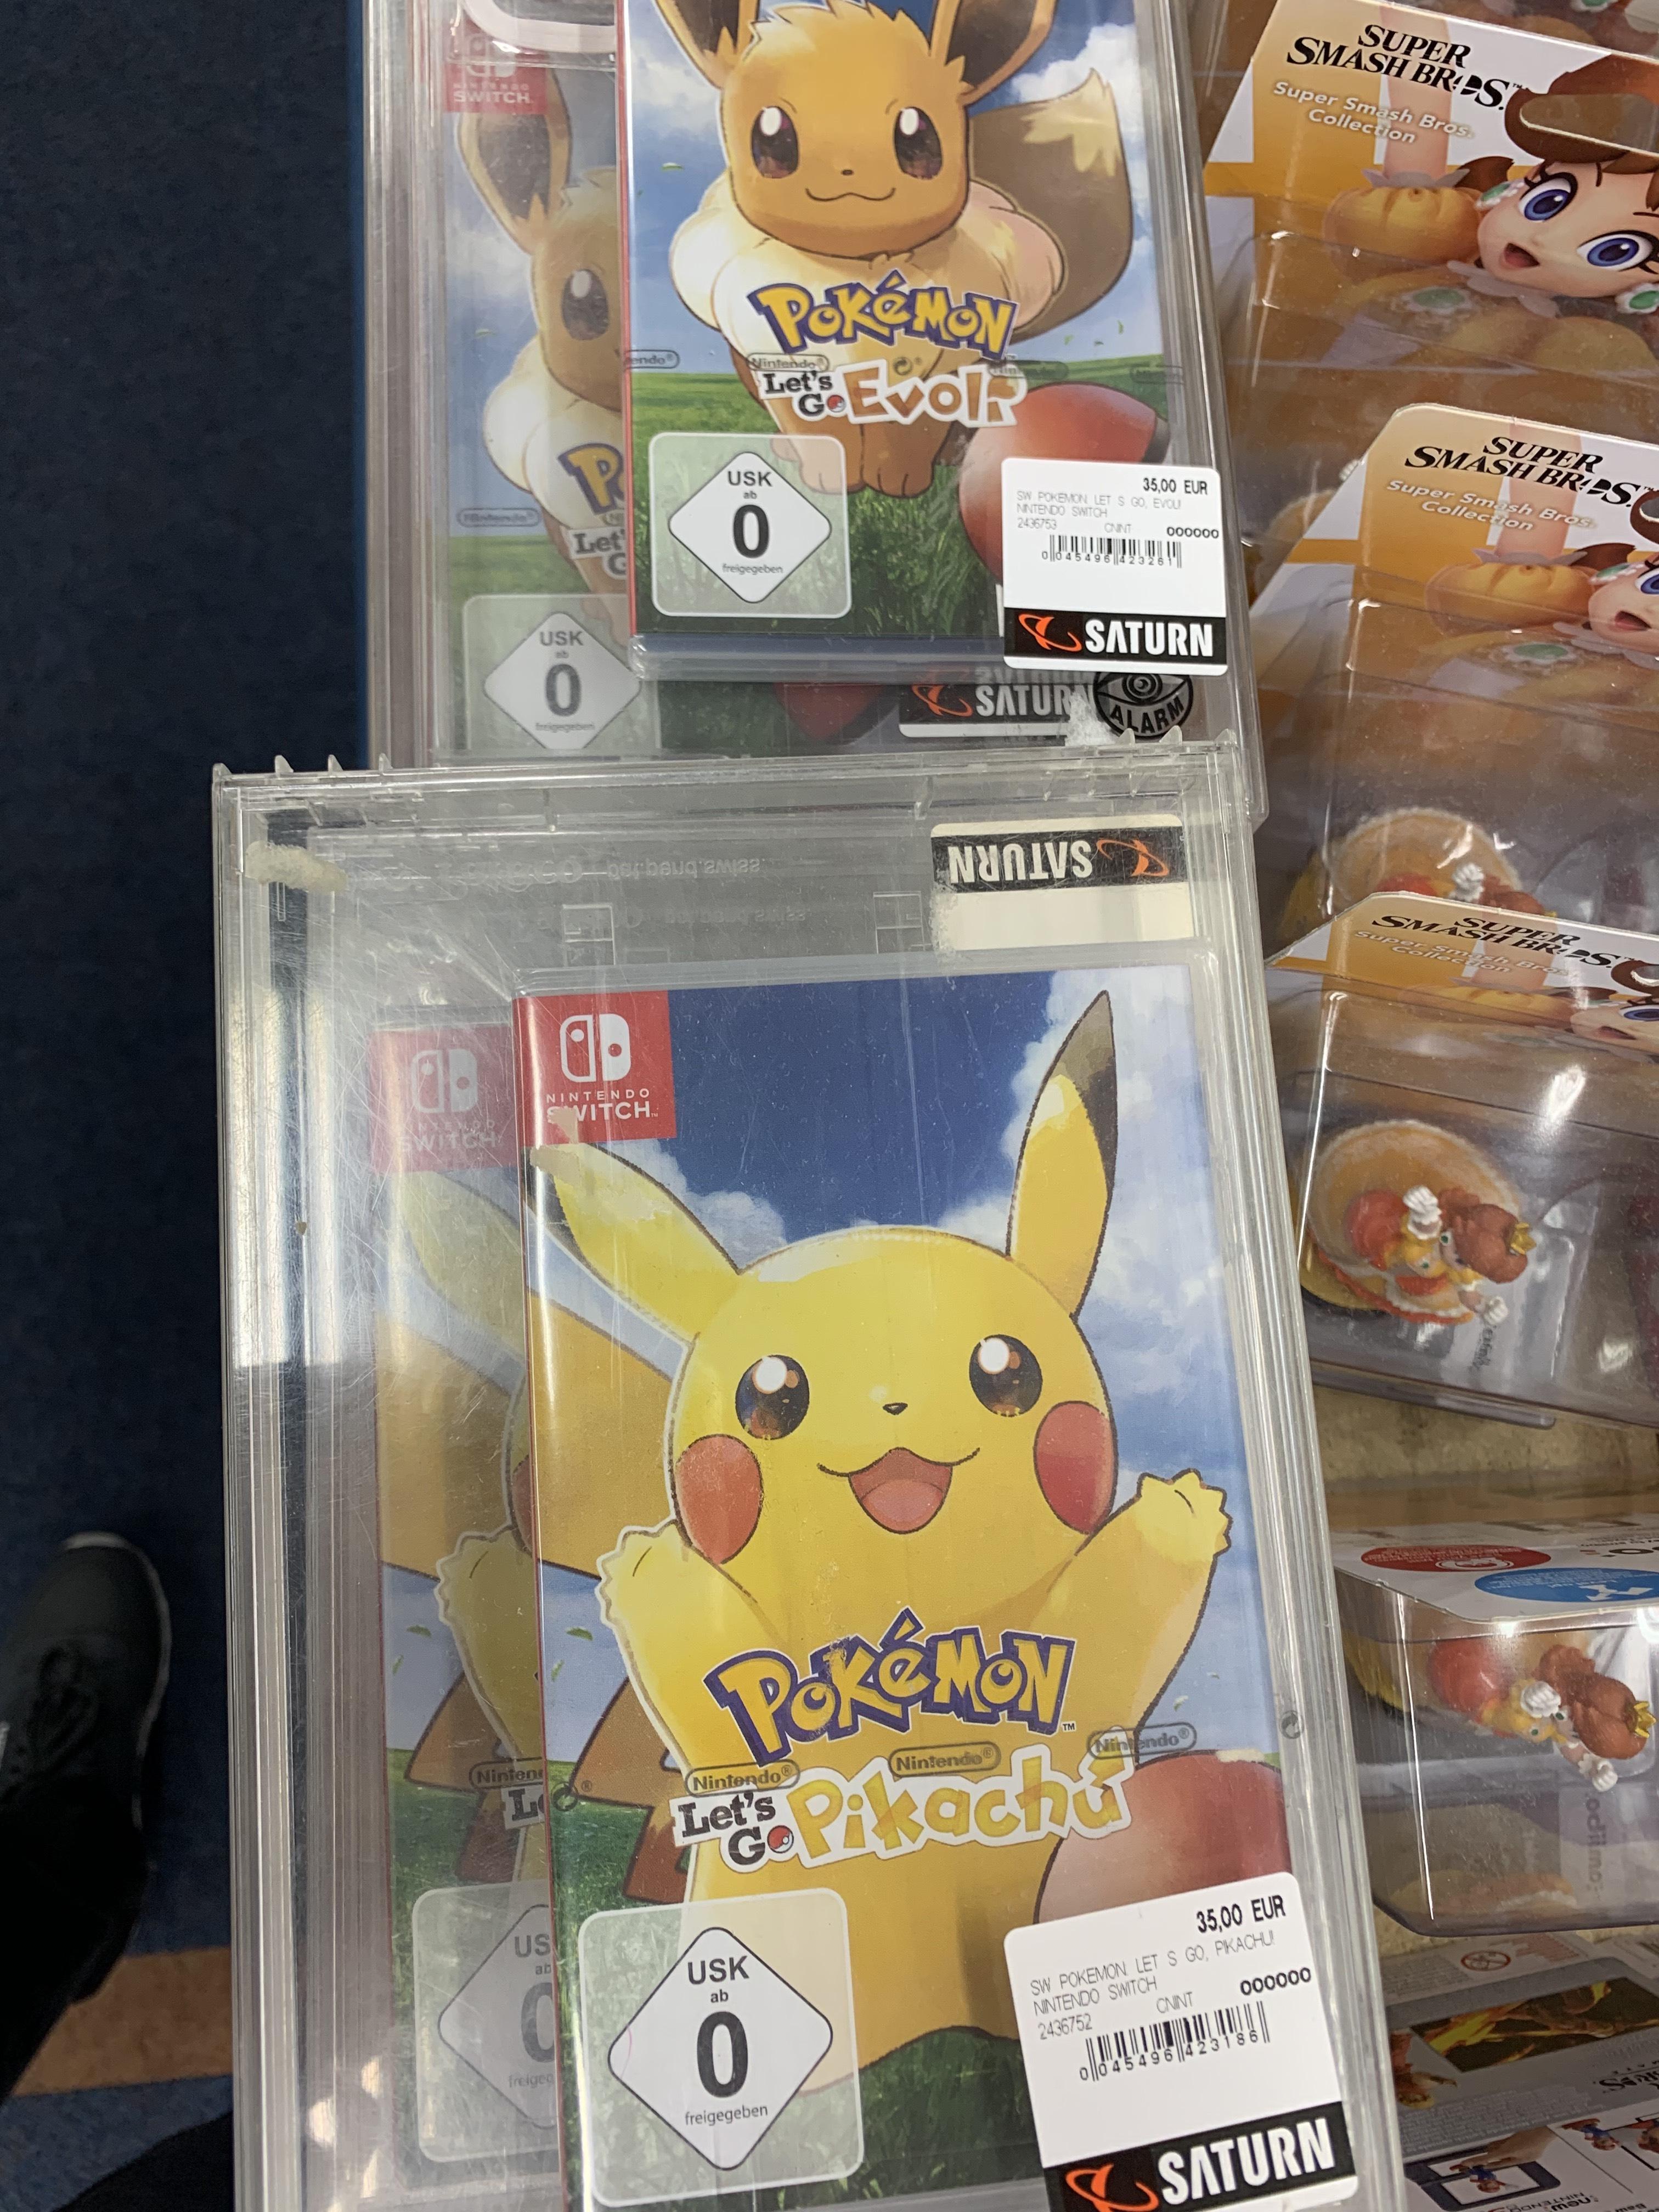 [Lokal Saturn Regensburg] Pokémon Let's Go Pikachu/Evoli für ~30 Euro